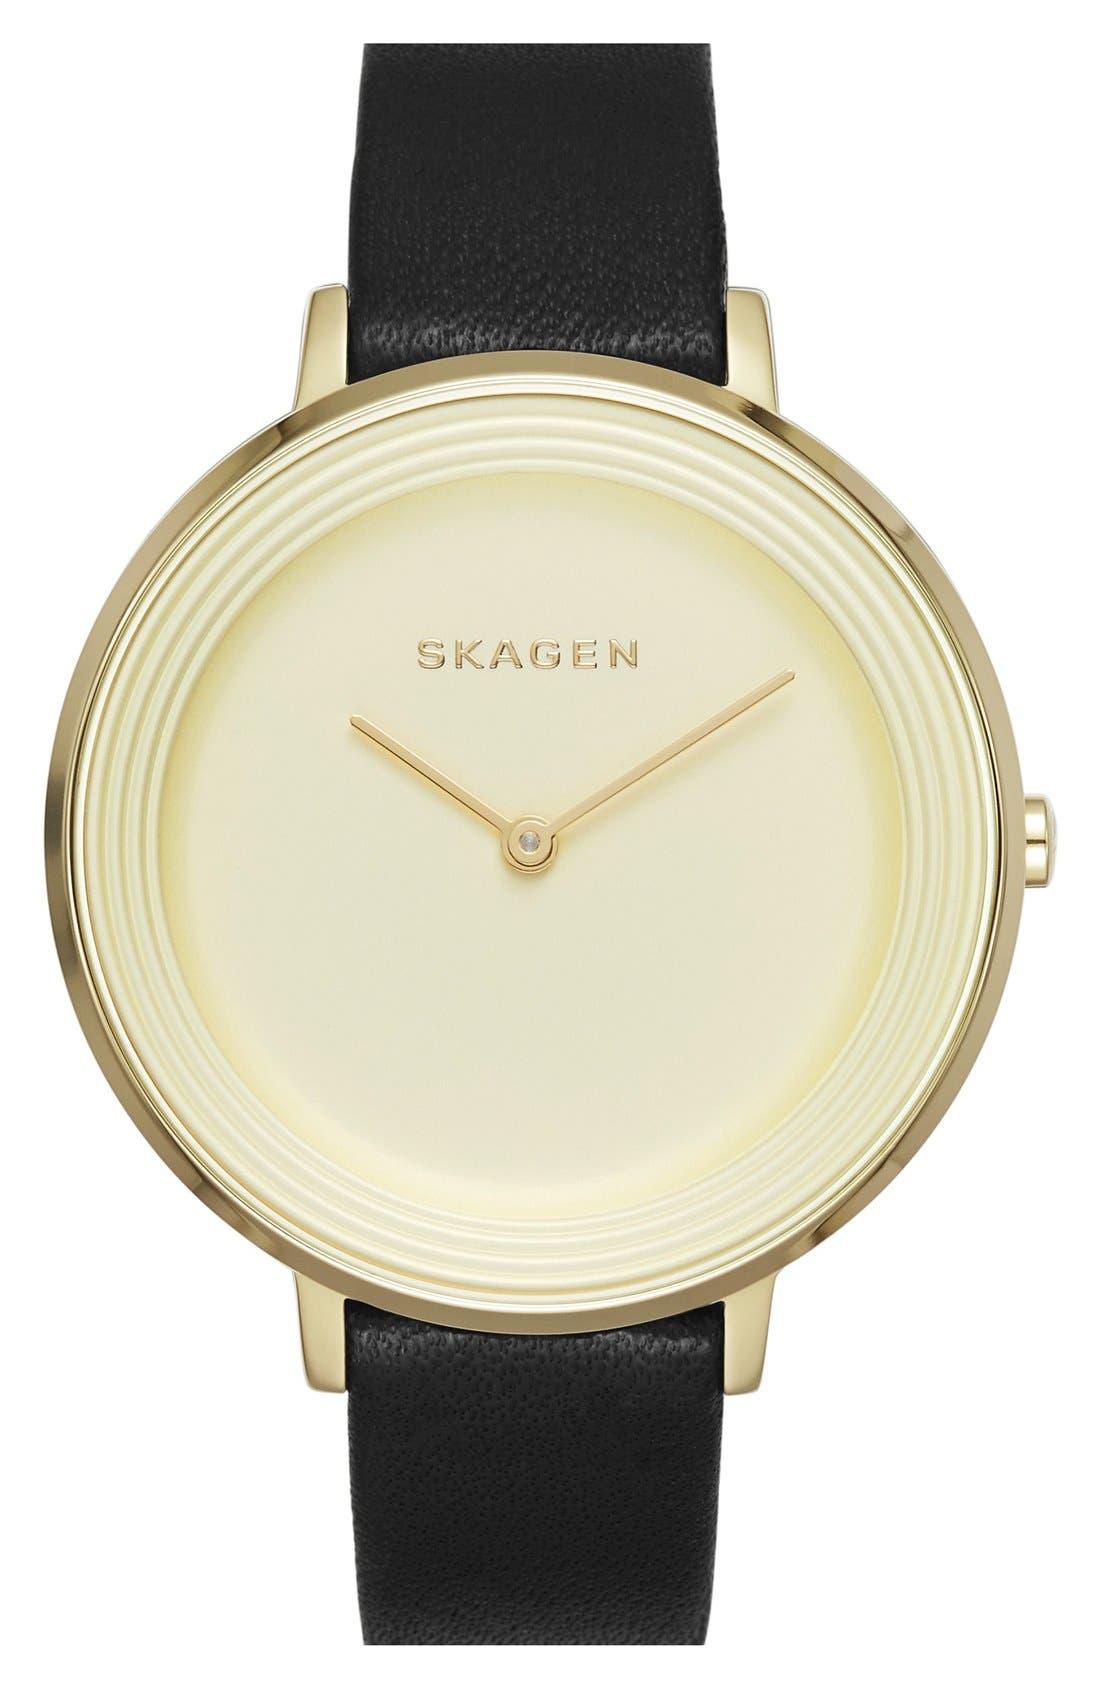 Main Image - Skagen 'Ditte' Round Textured Dial Watch, 37mm (Nordstrom Exclusive)